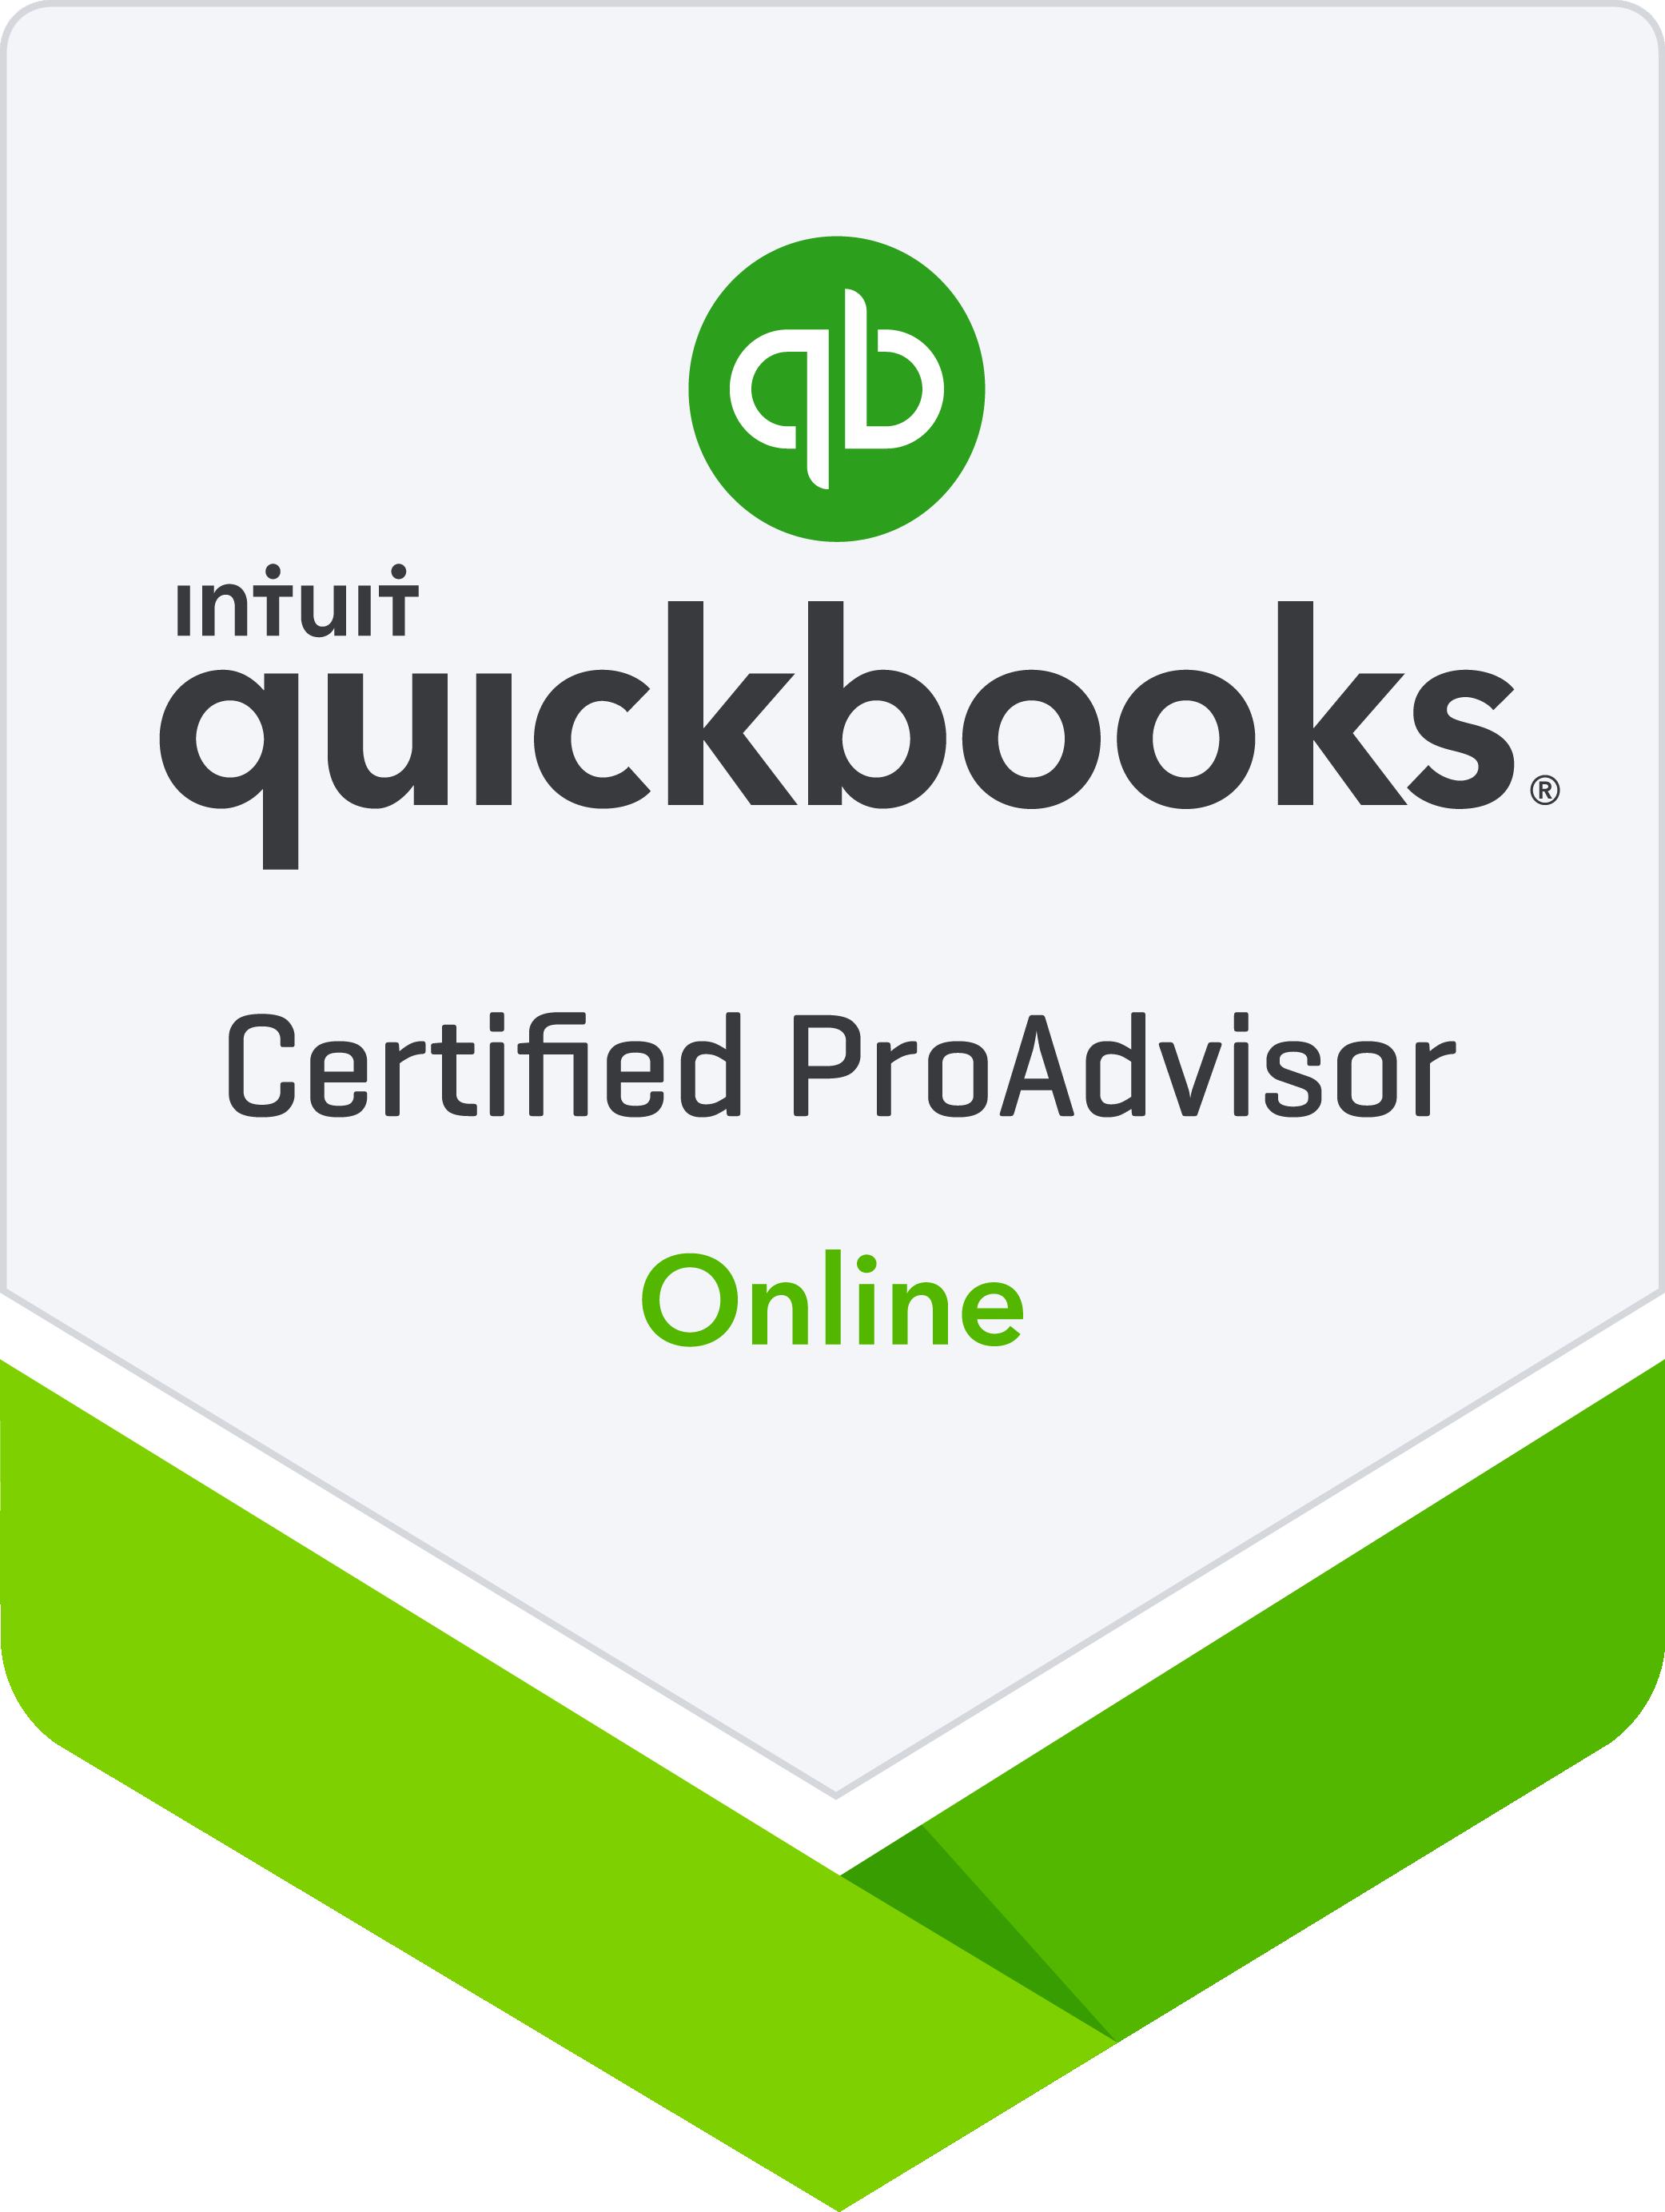 QuickBooks_Online_Certified_ProAdvisor